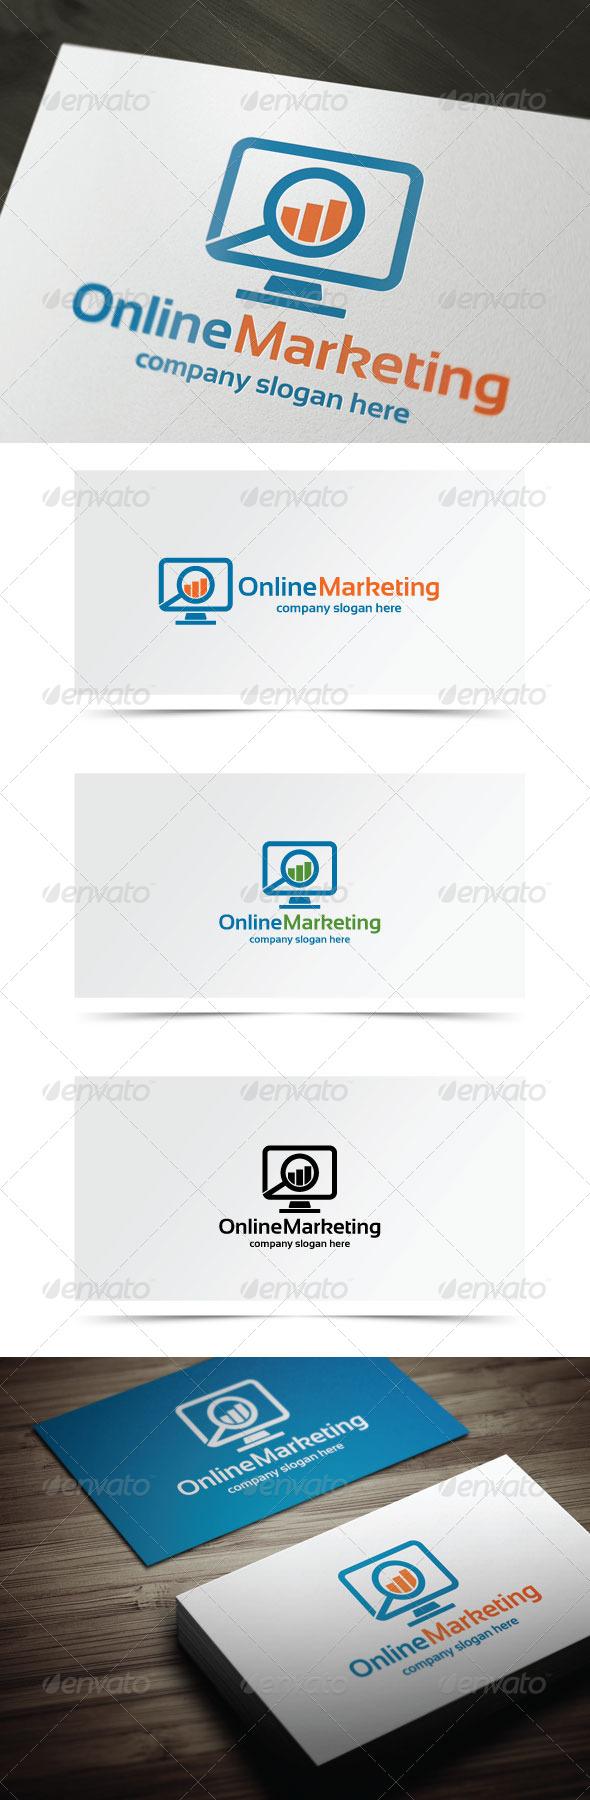 GraphicRiver Online Marketing 7516598